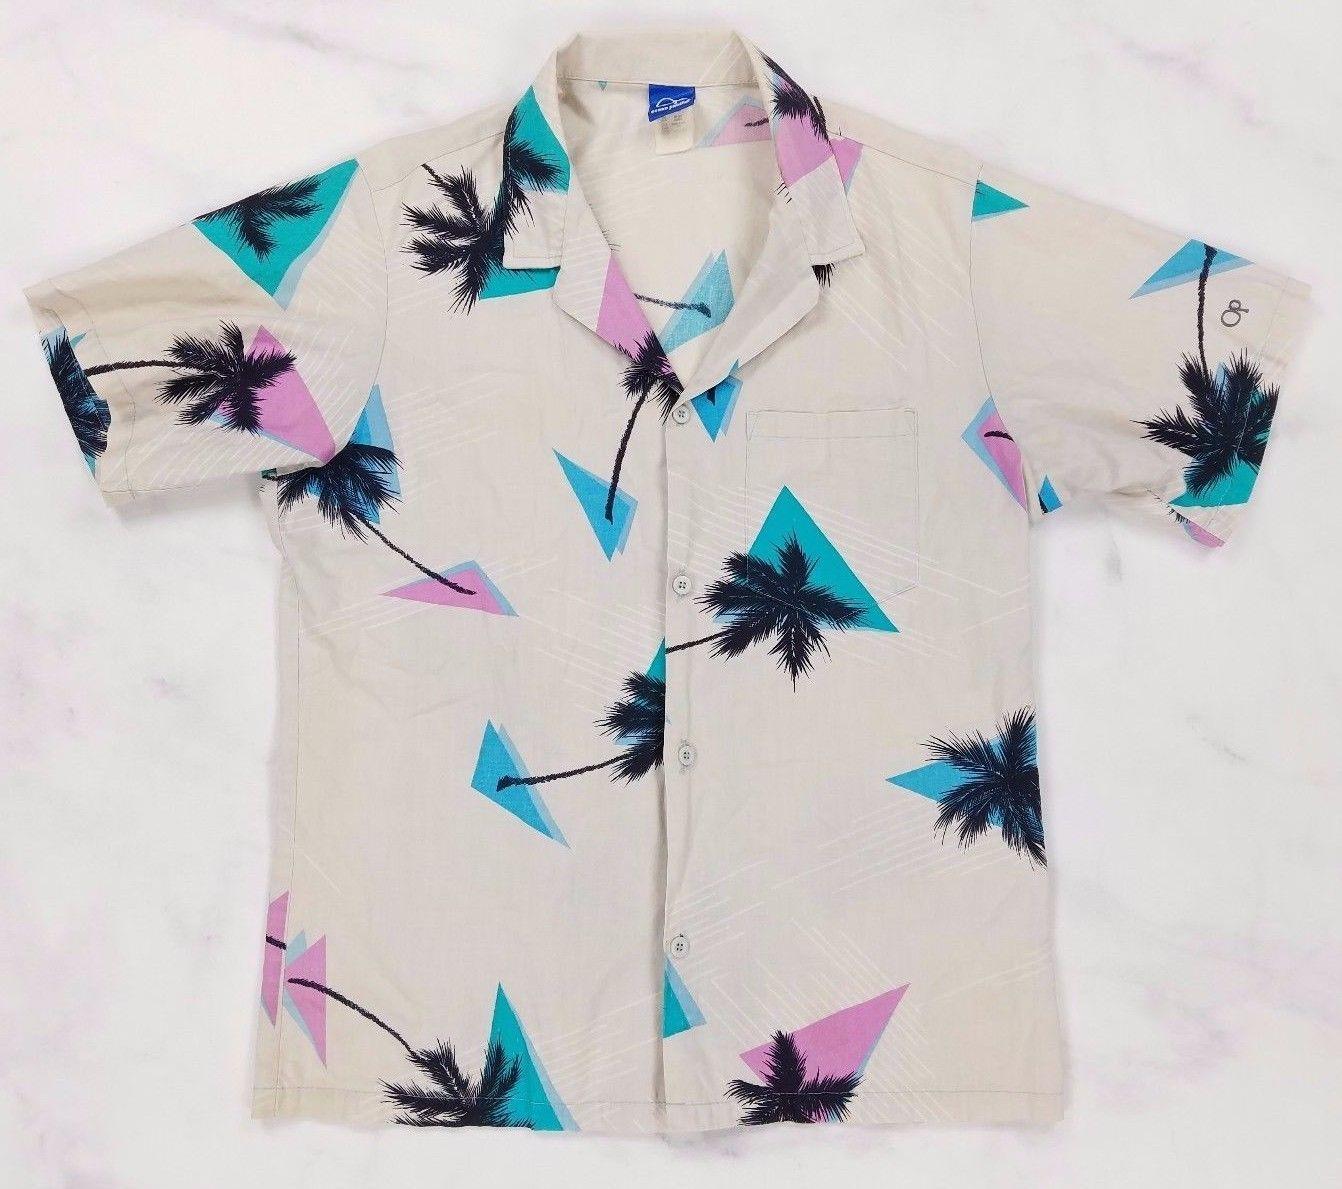 Vintage OP Ocean Pacific Banana Tropical Fruit Shirt